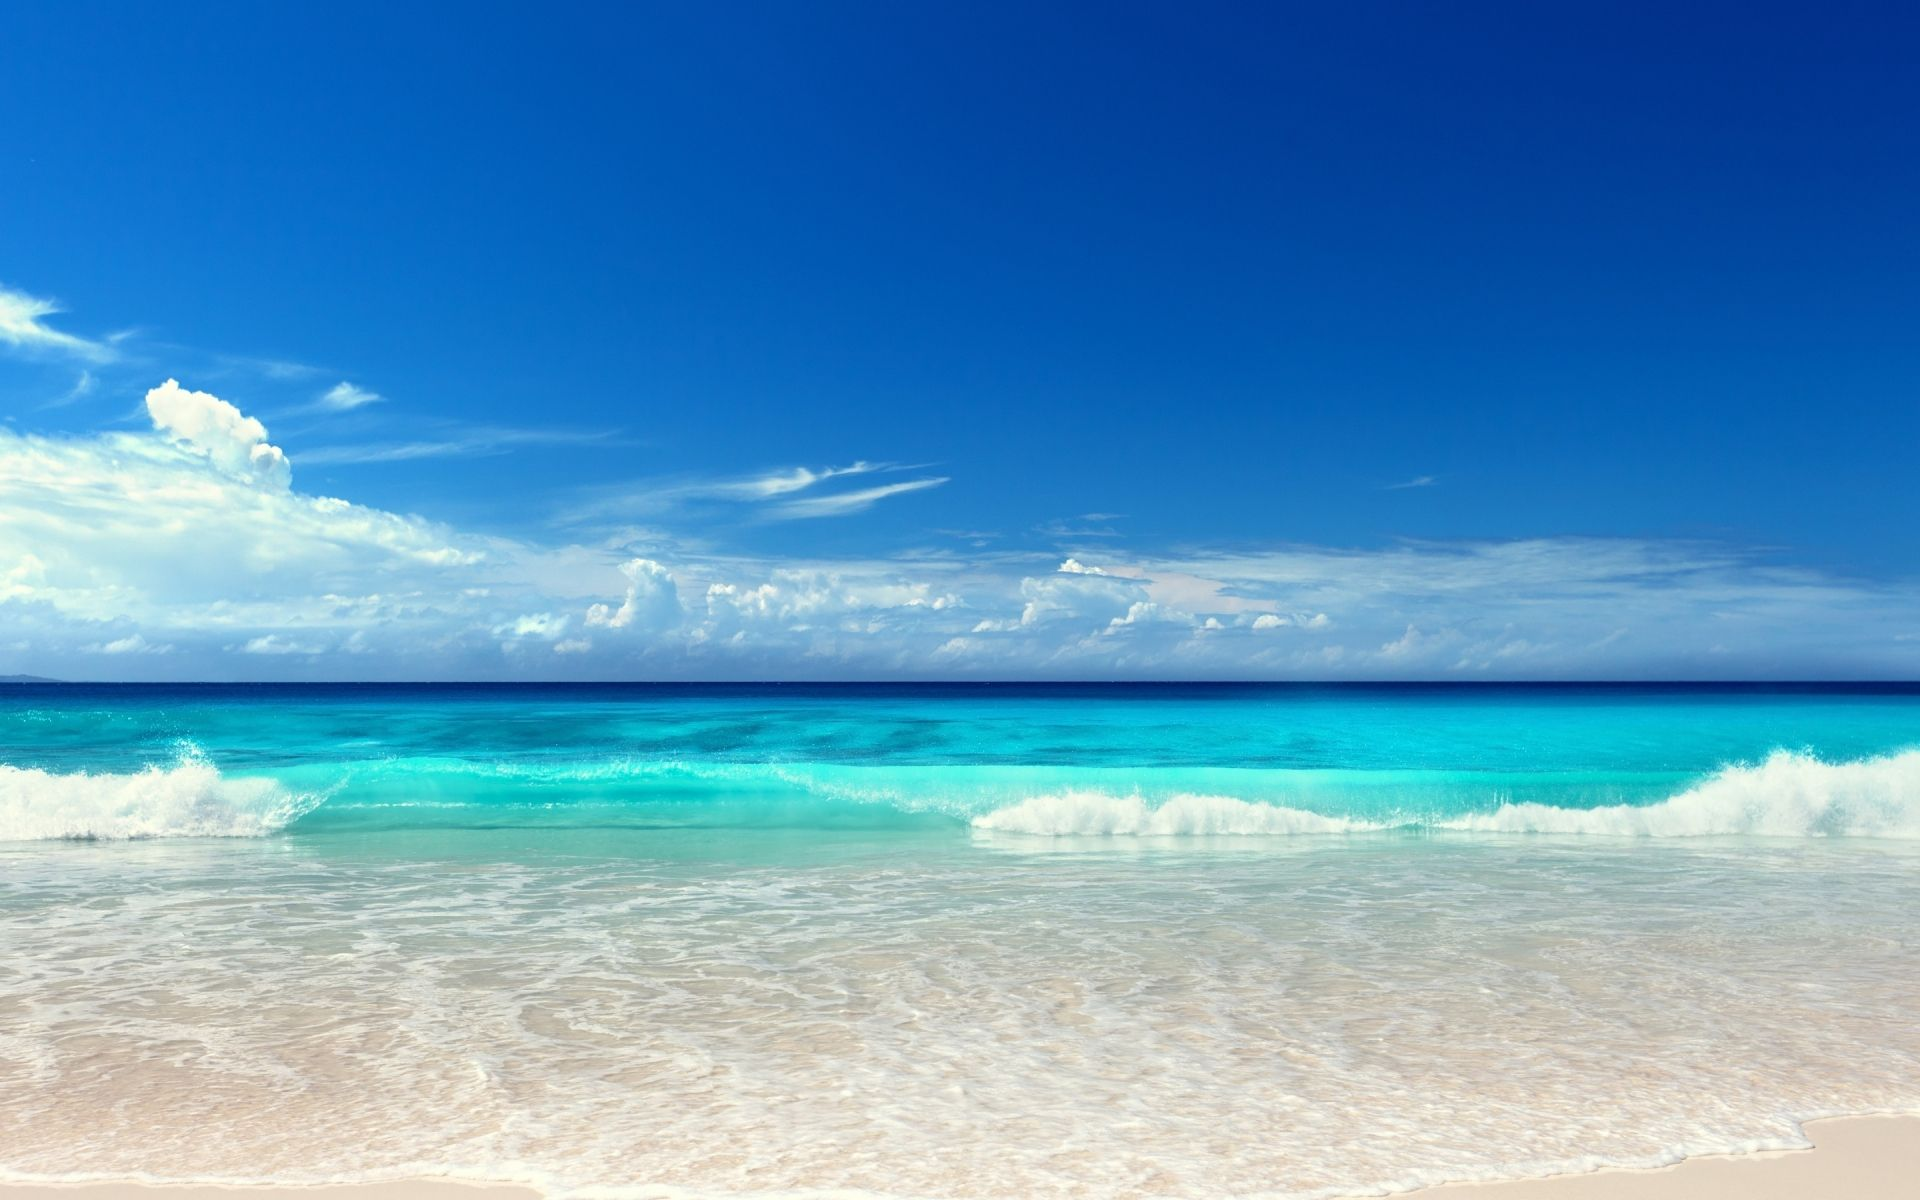 Ocean 4k Ipad Wallpapers Top Free Ocean 4k Ipad Backgrounds Wallpaperaccess